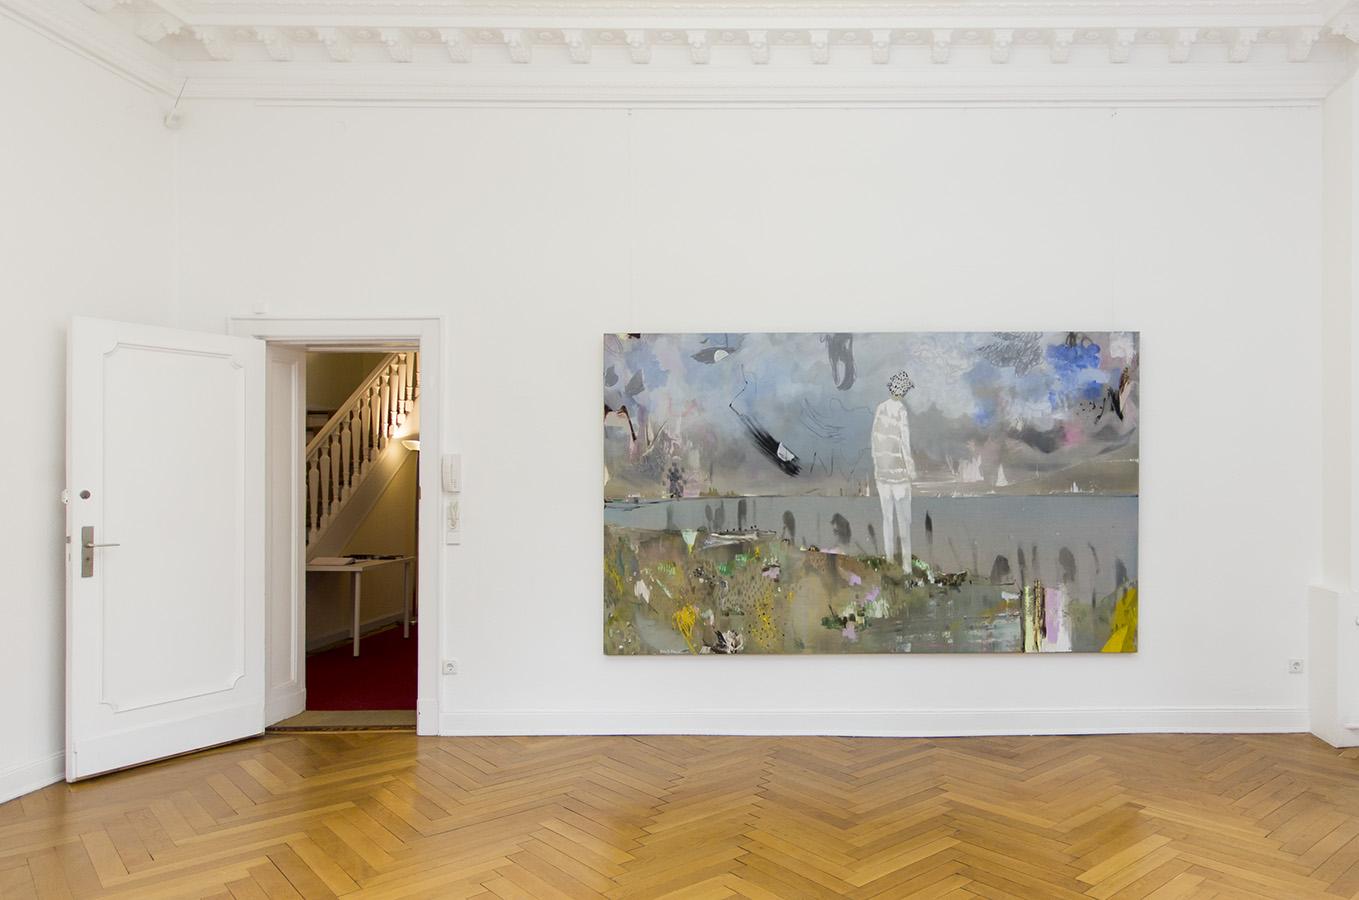 Kevin A. Rausch - No Mans Land @ Köppe Contemporary